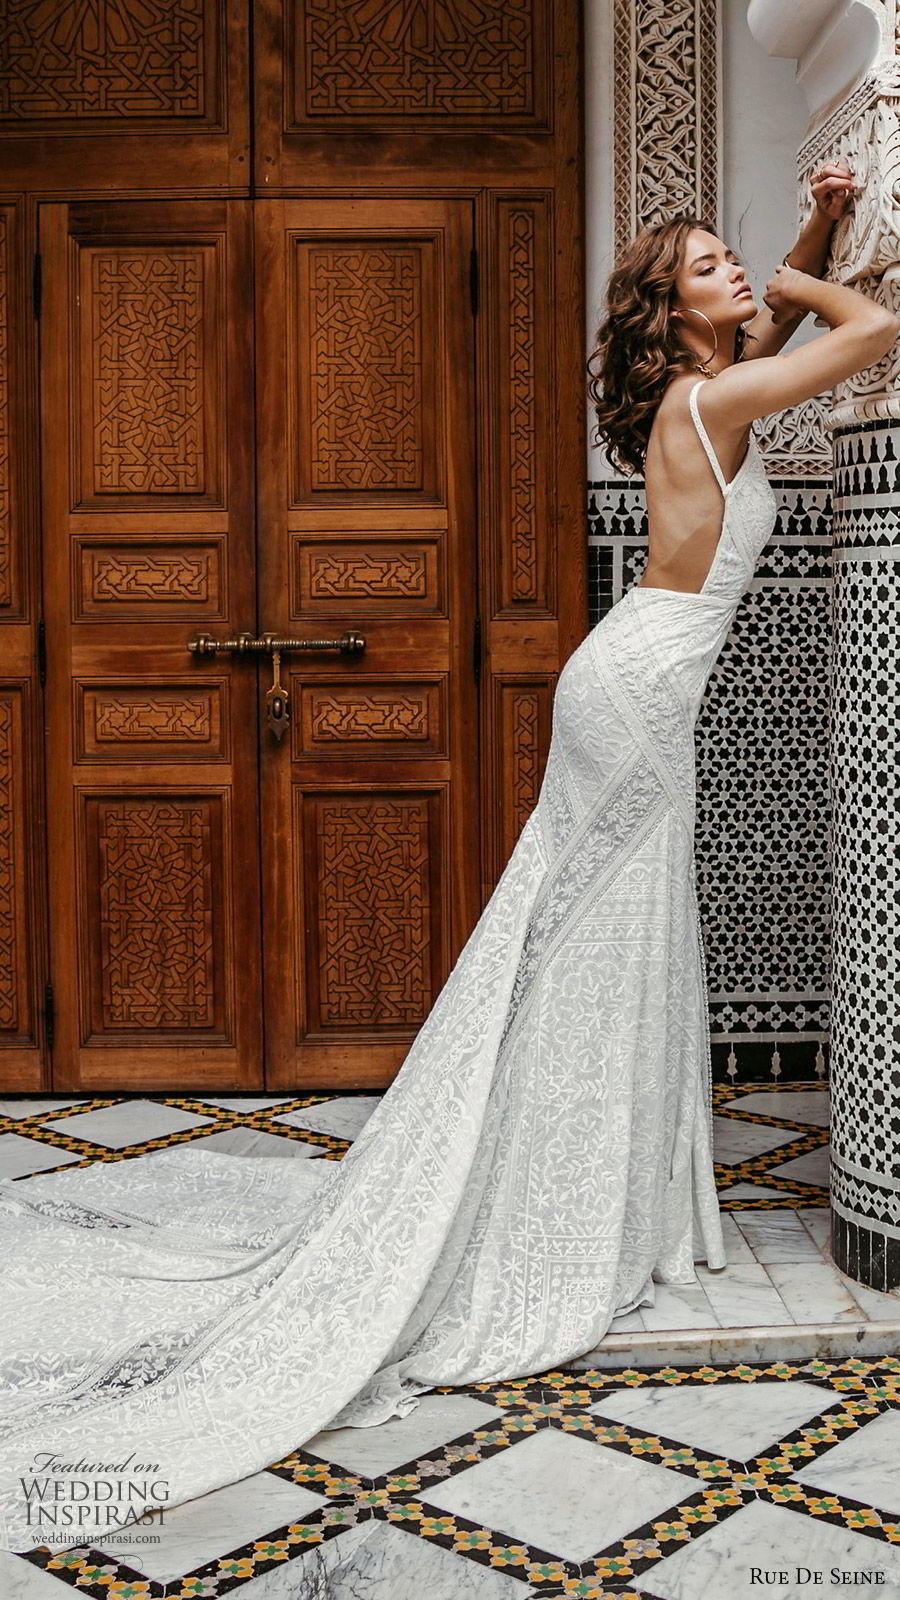 rue de seine 2019 bridal sleeveless thick straps deep v neckline lace fit flare sheath wedding dress (11) boho chic romantic open back chapel train sv